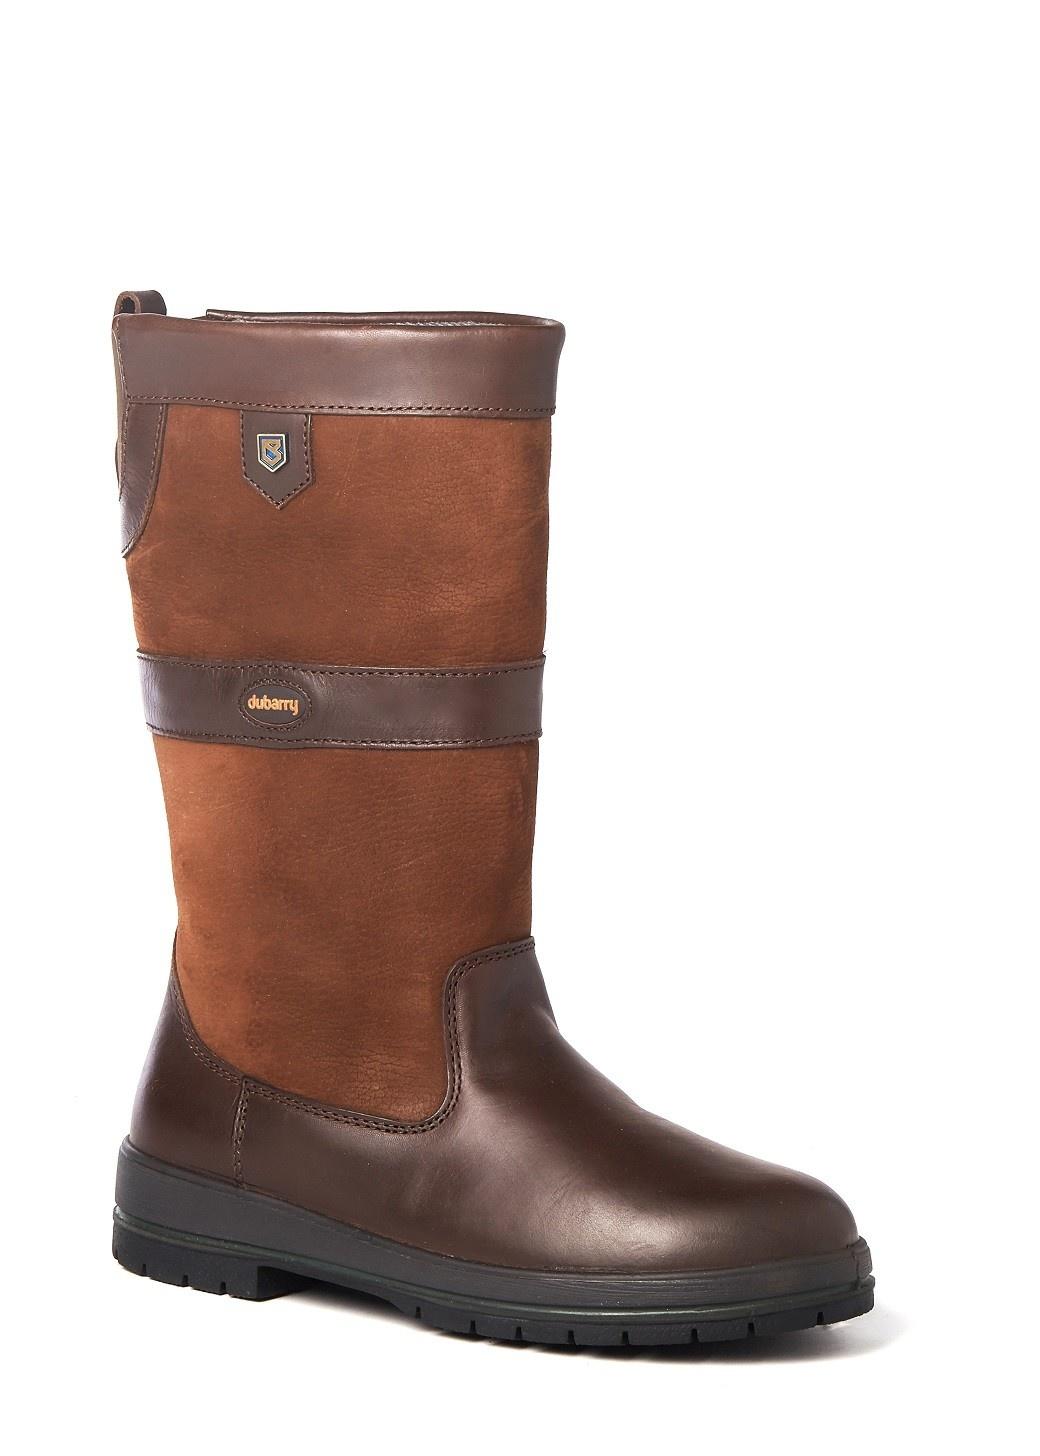 Dubarry Kildare outdoor laarzen - Walnut-1